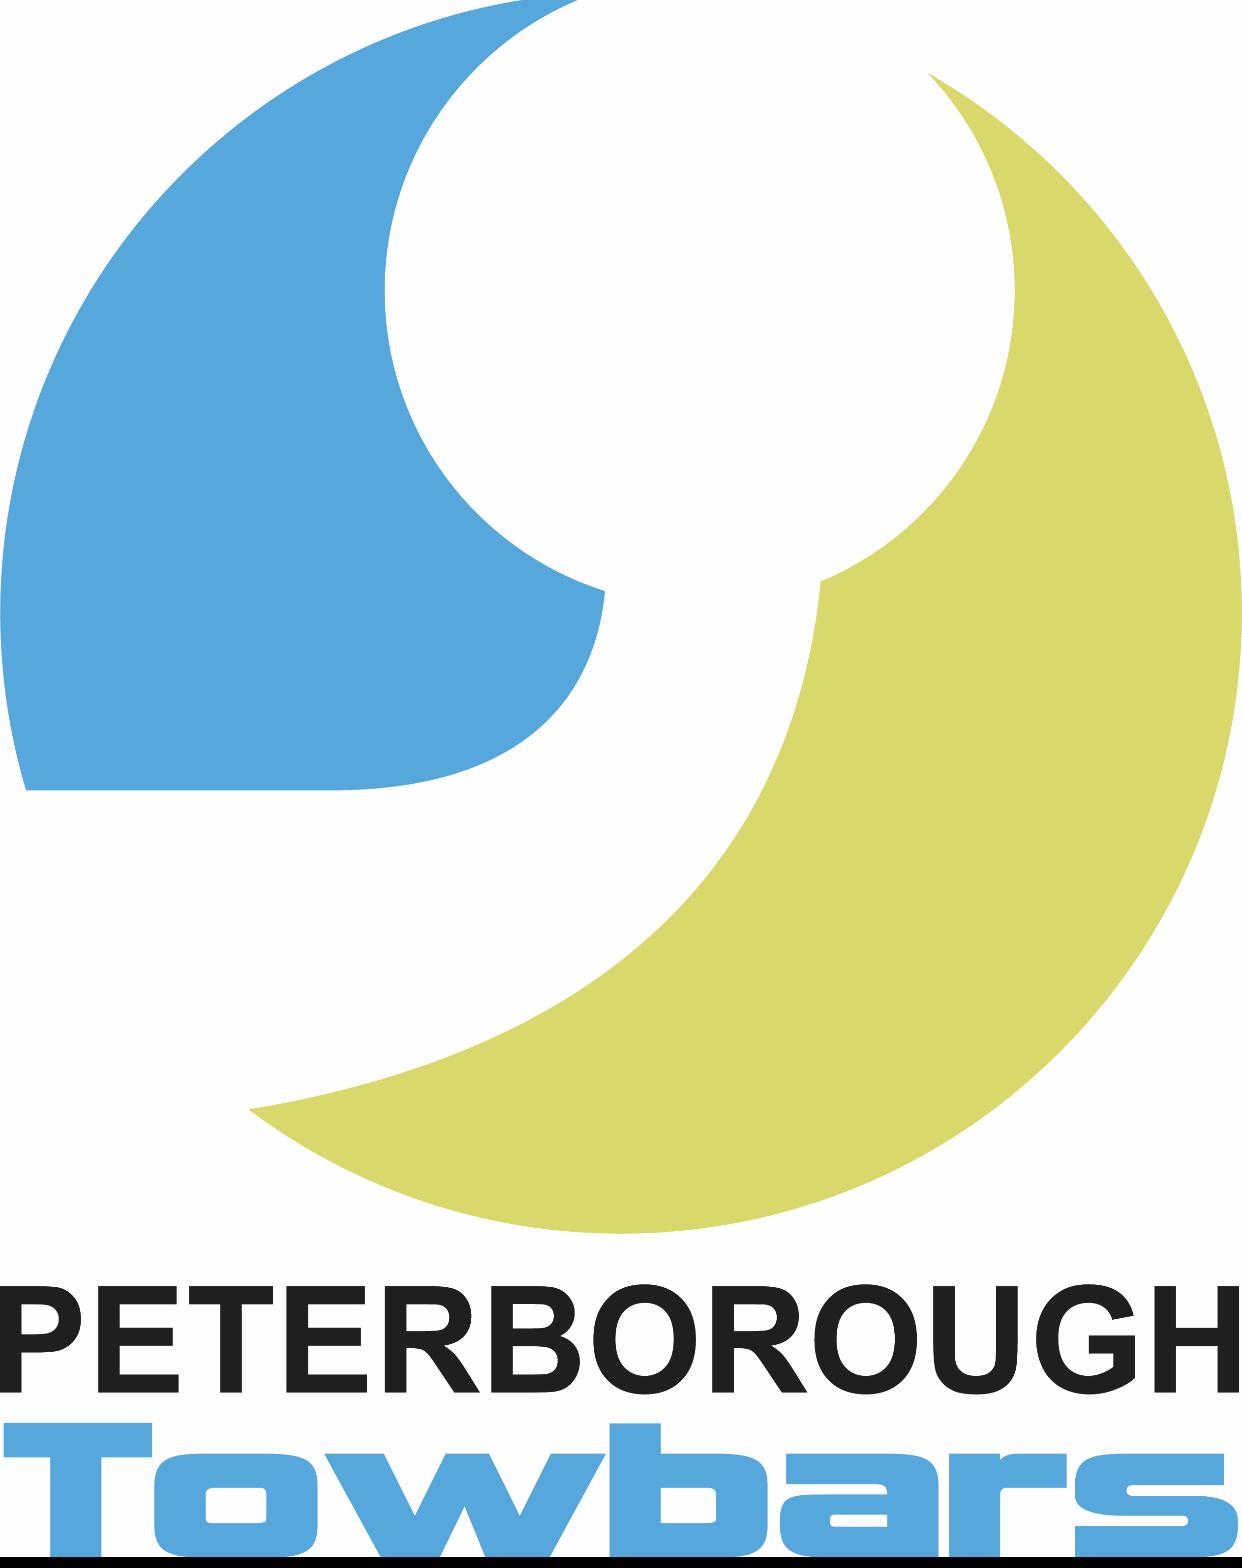 Peterborough towbars